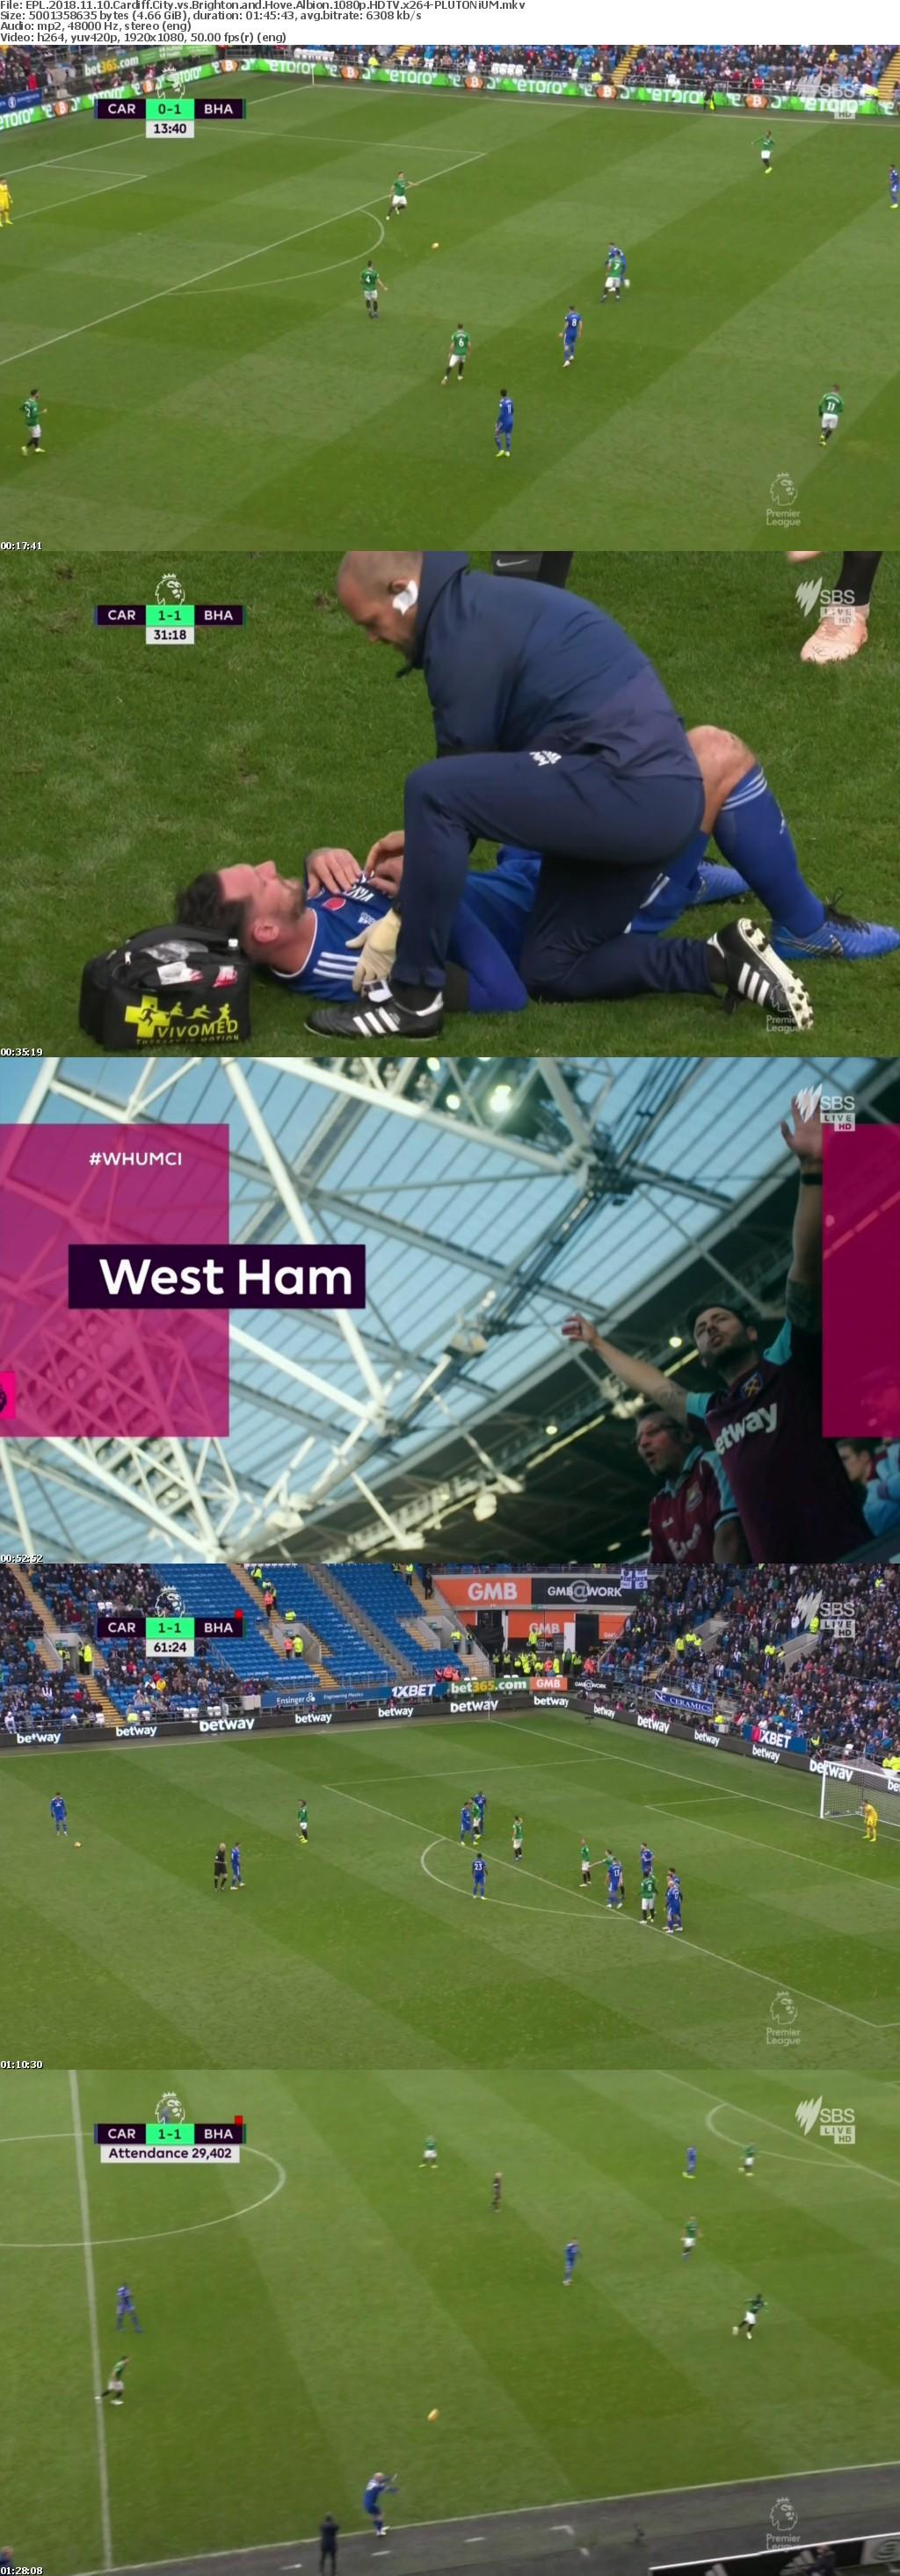 EPL 2018 11 10 Cardiff City vs Brighton and Hove Albion 1080p HDTV x264-PLUTONiUM